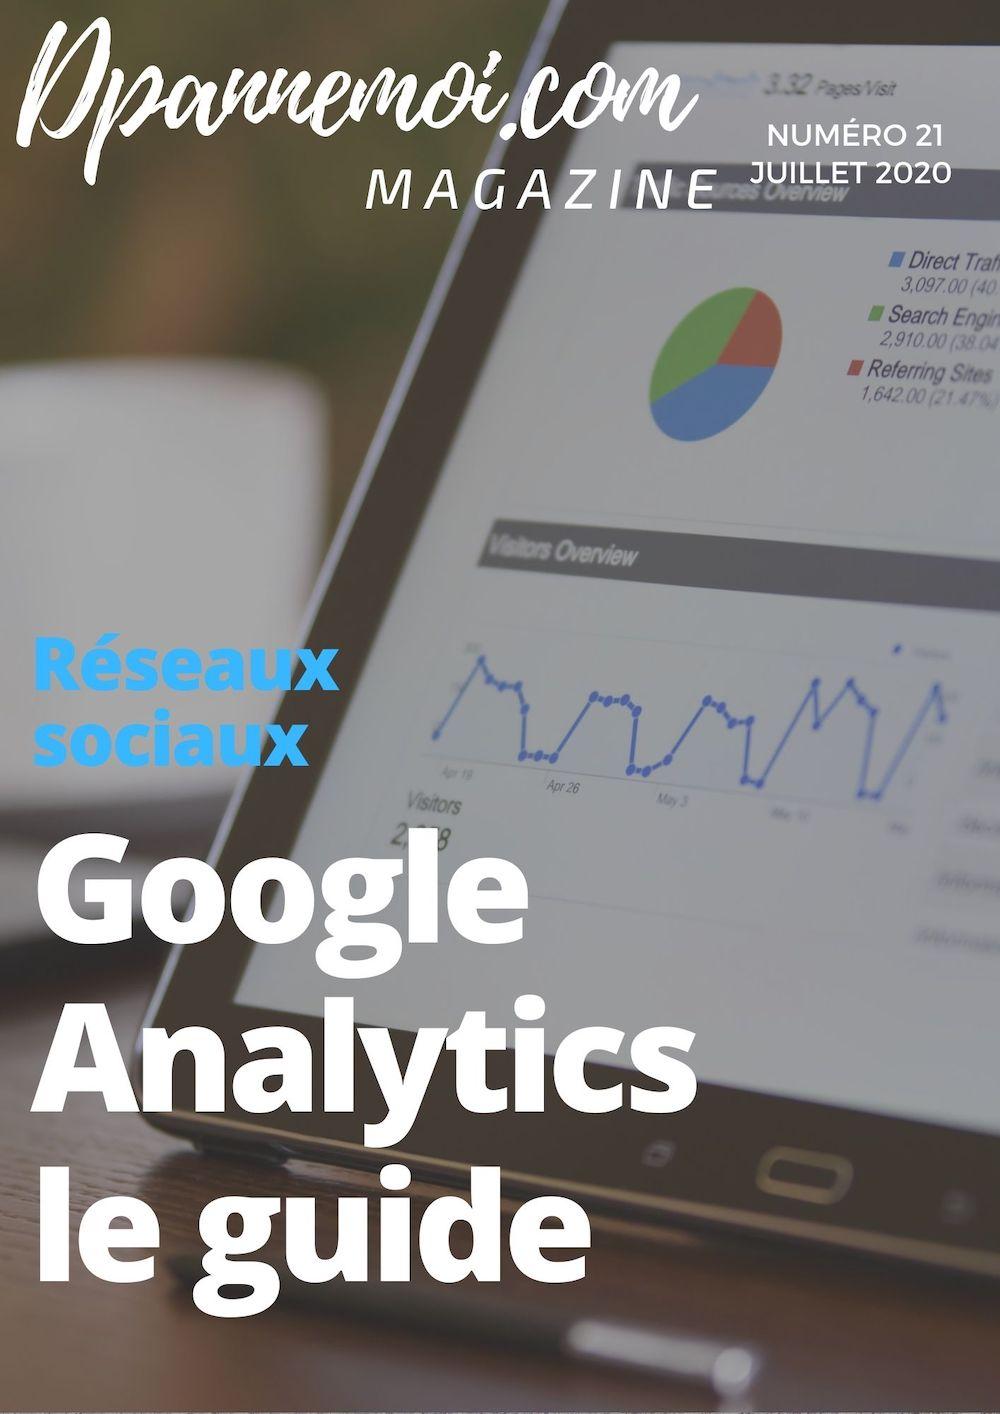 Le guide pour comprendre Google Analytics